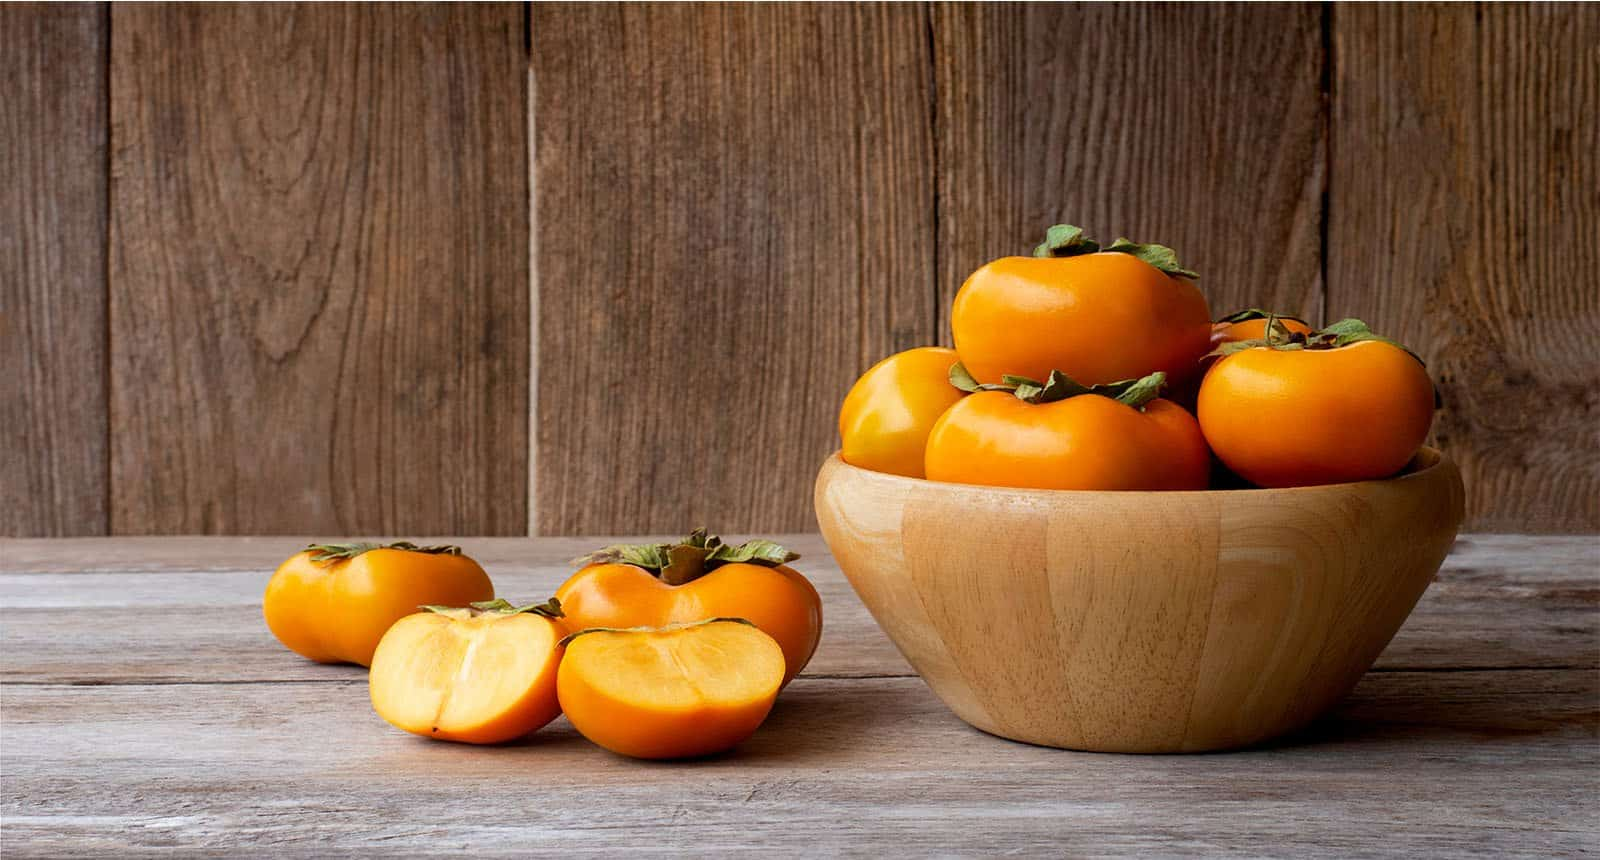 Persimmons Persimon Fruits